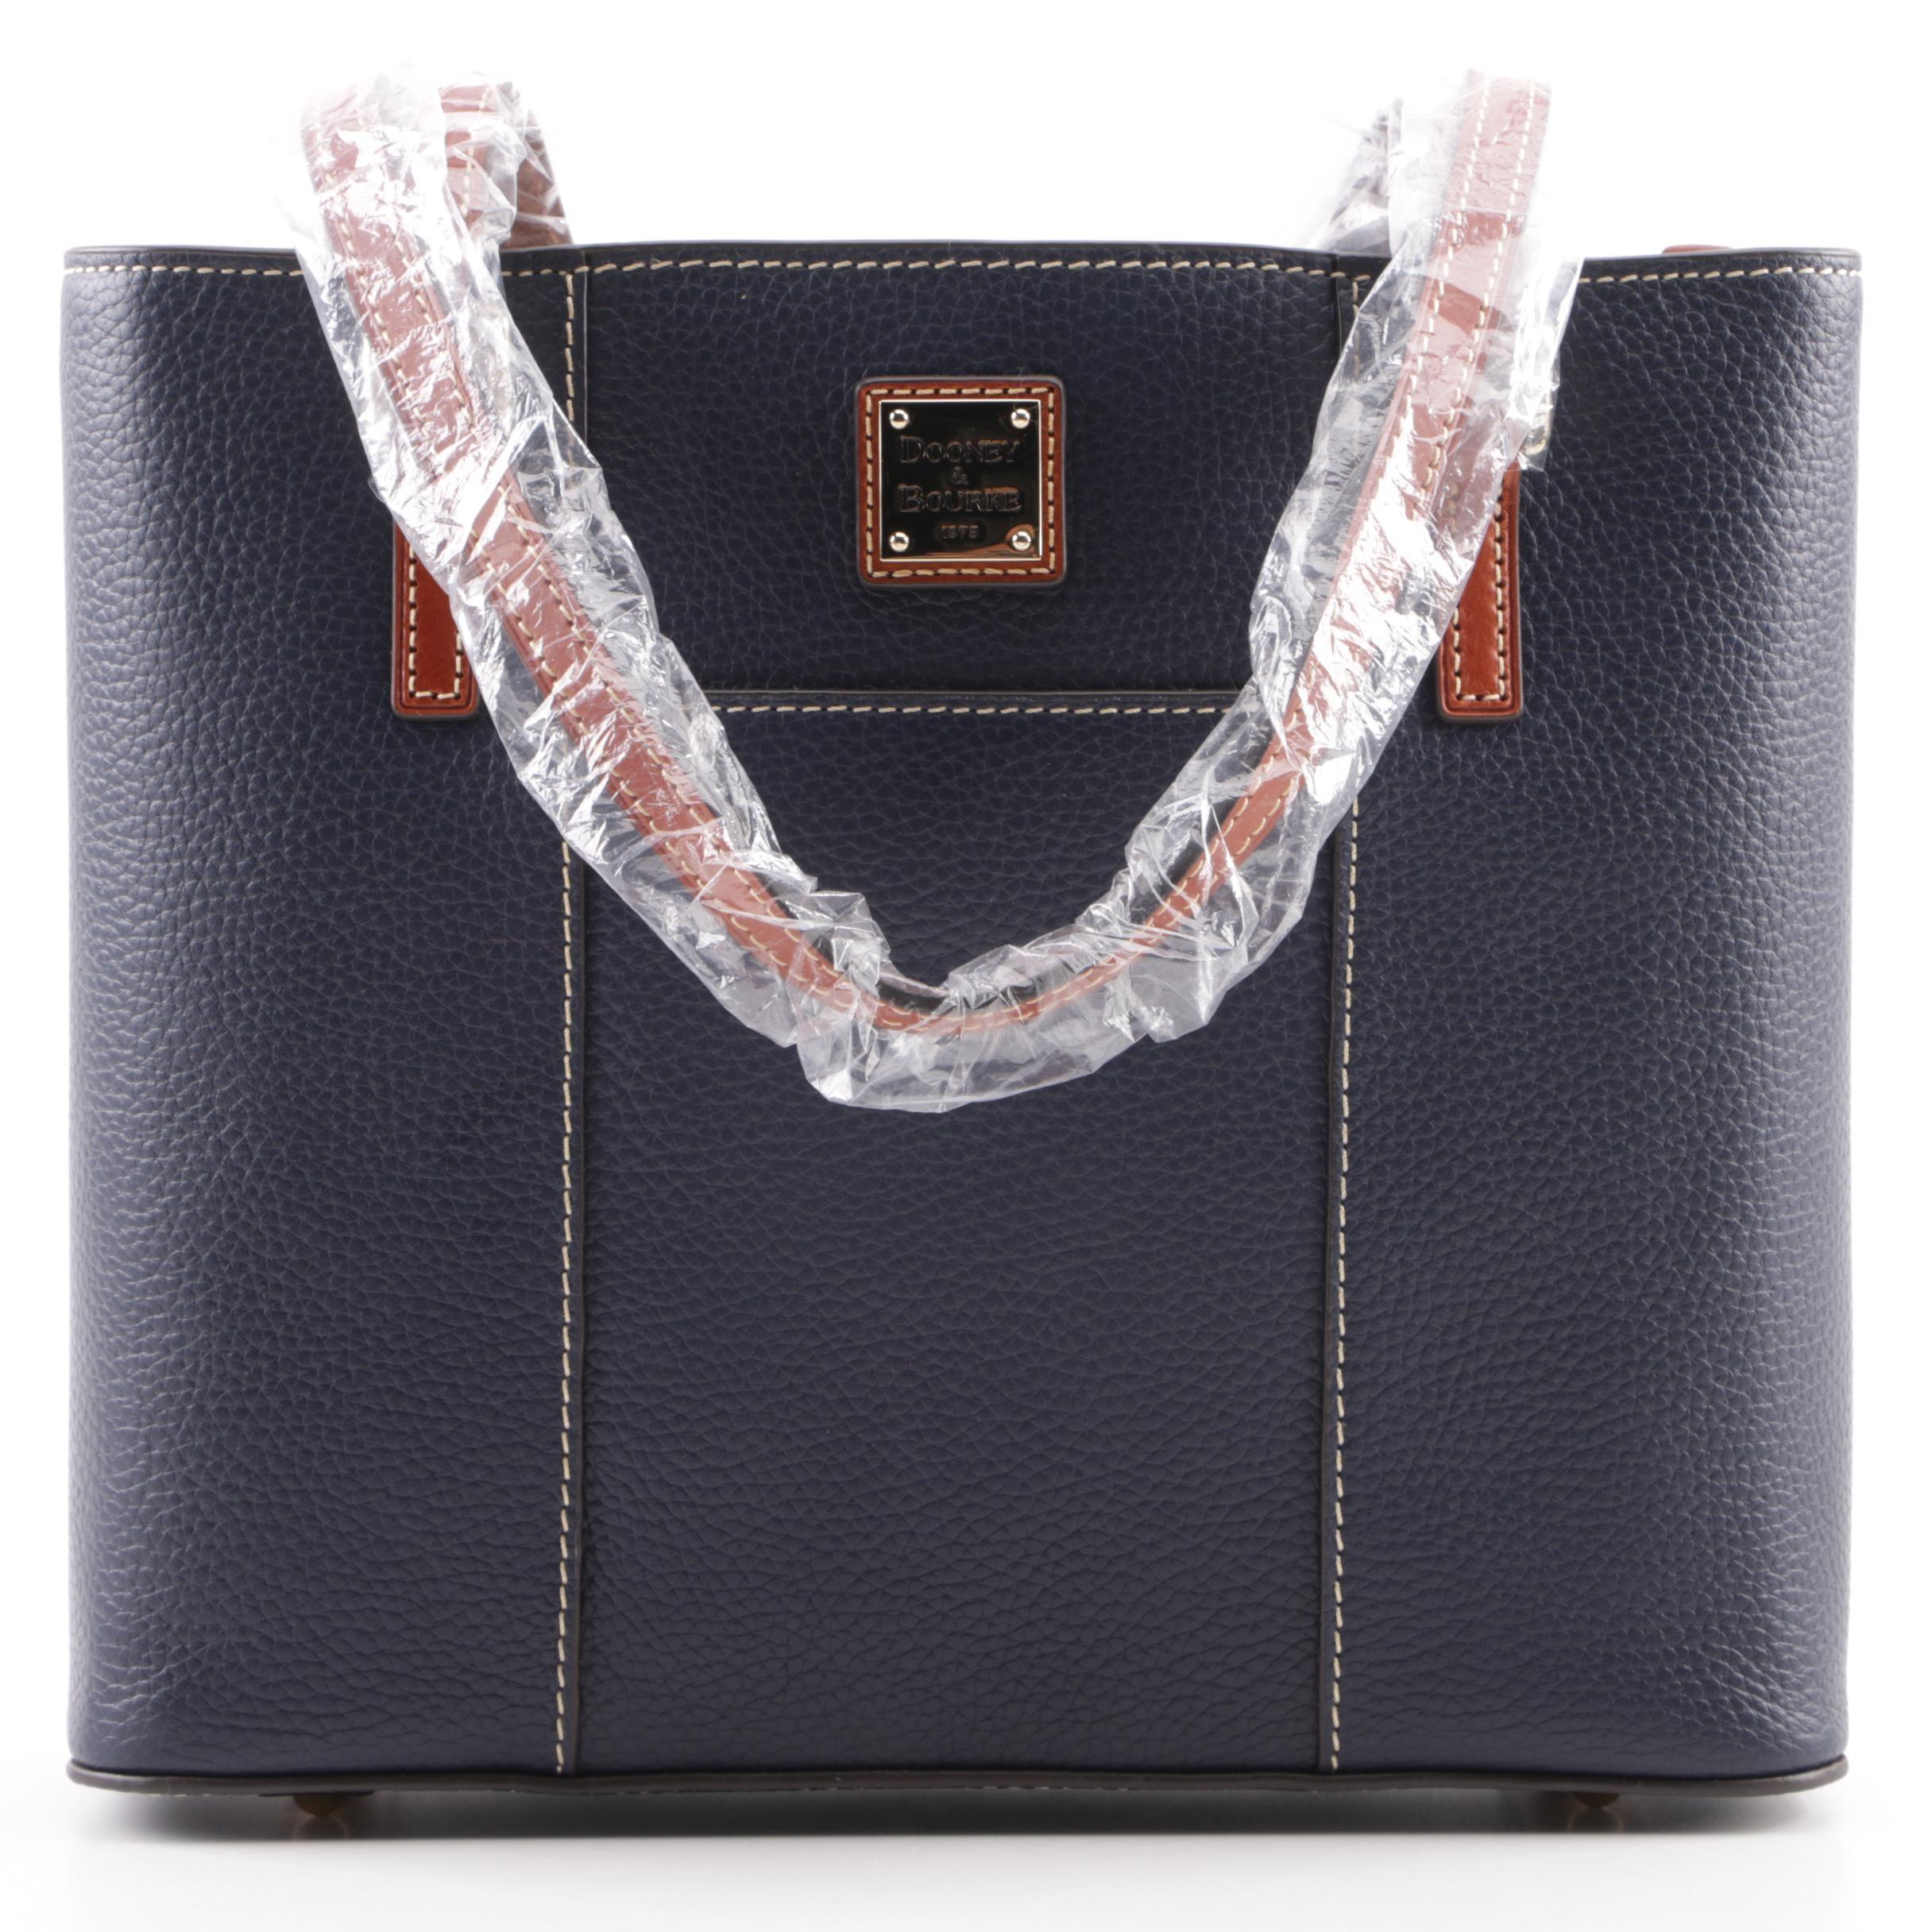 Dooney & Bourke Small Lexington Midnight Blue Pebbled Leather Shopper Tote